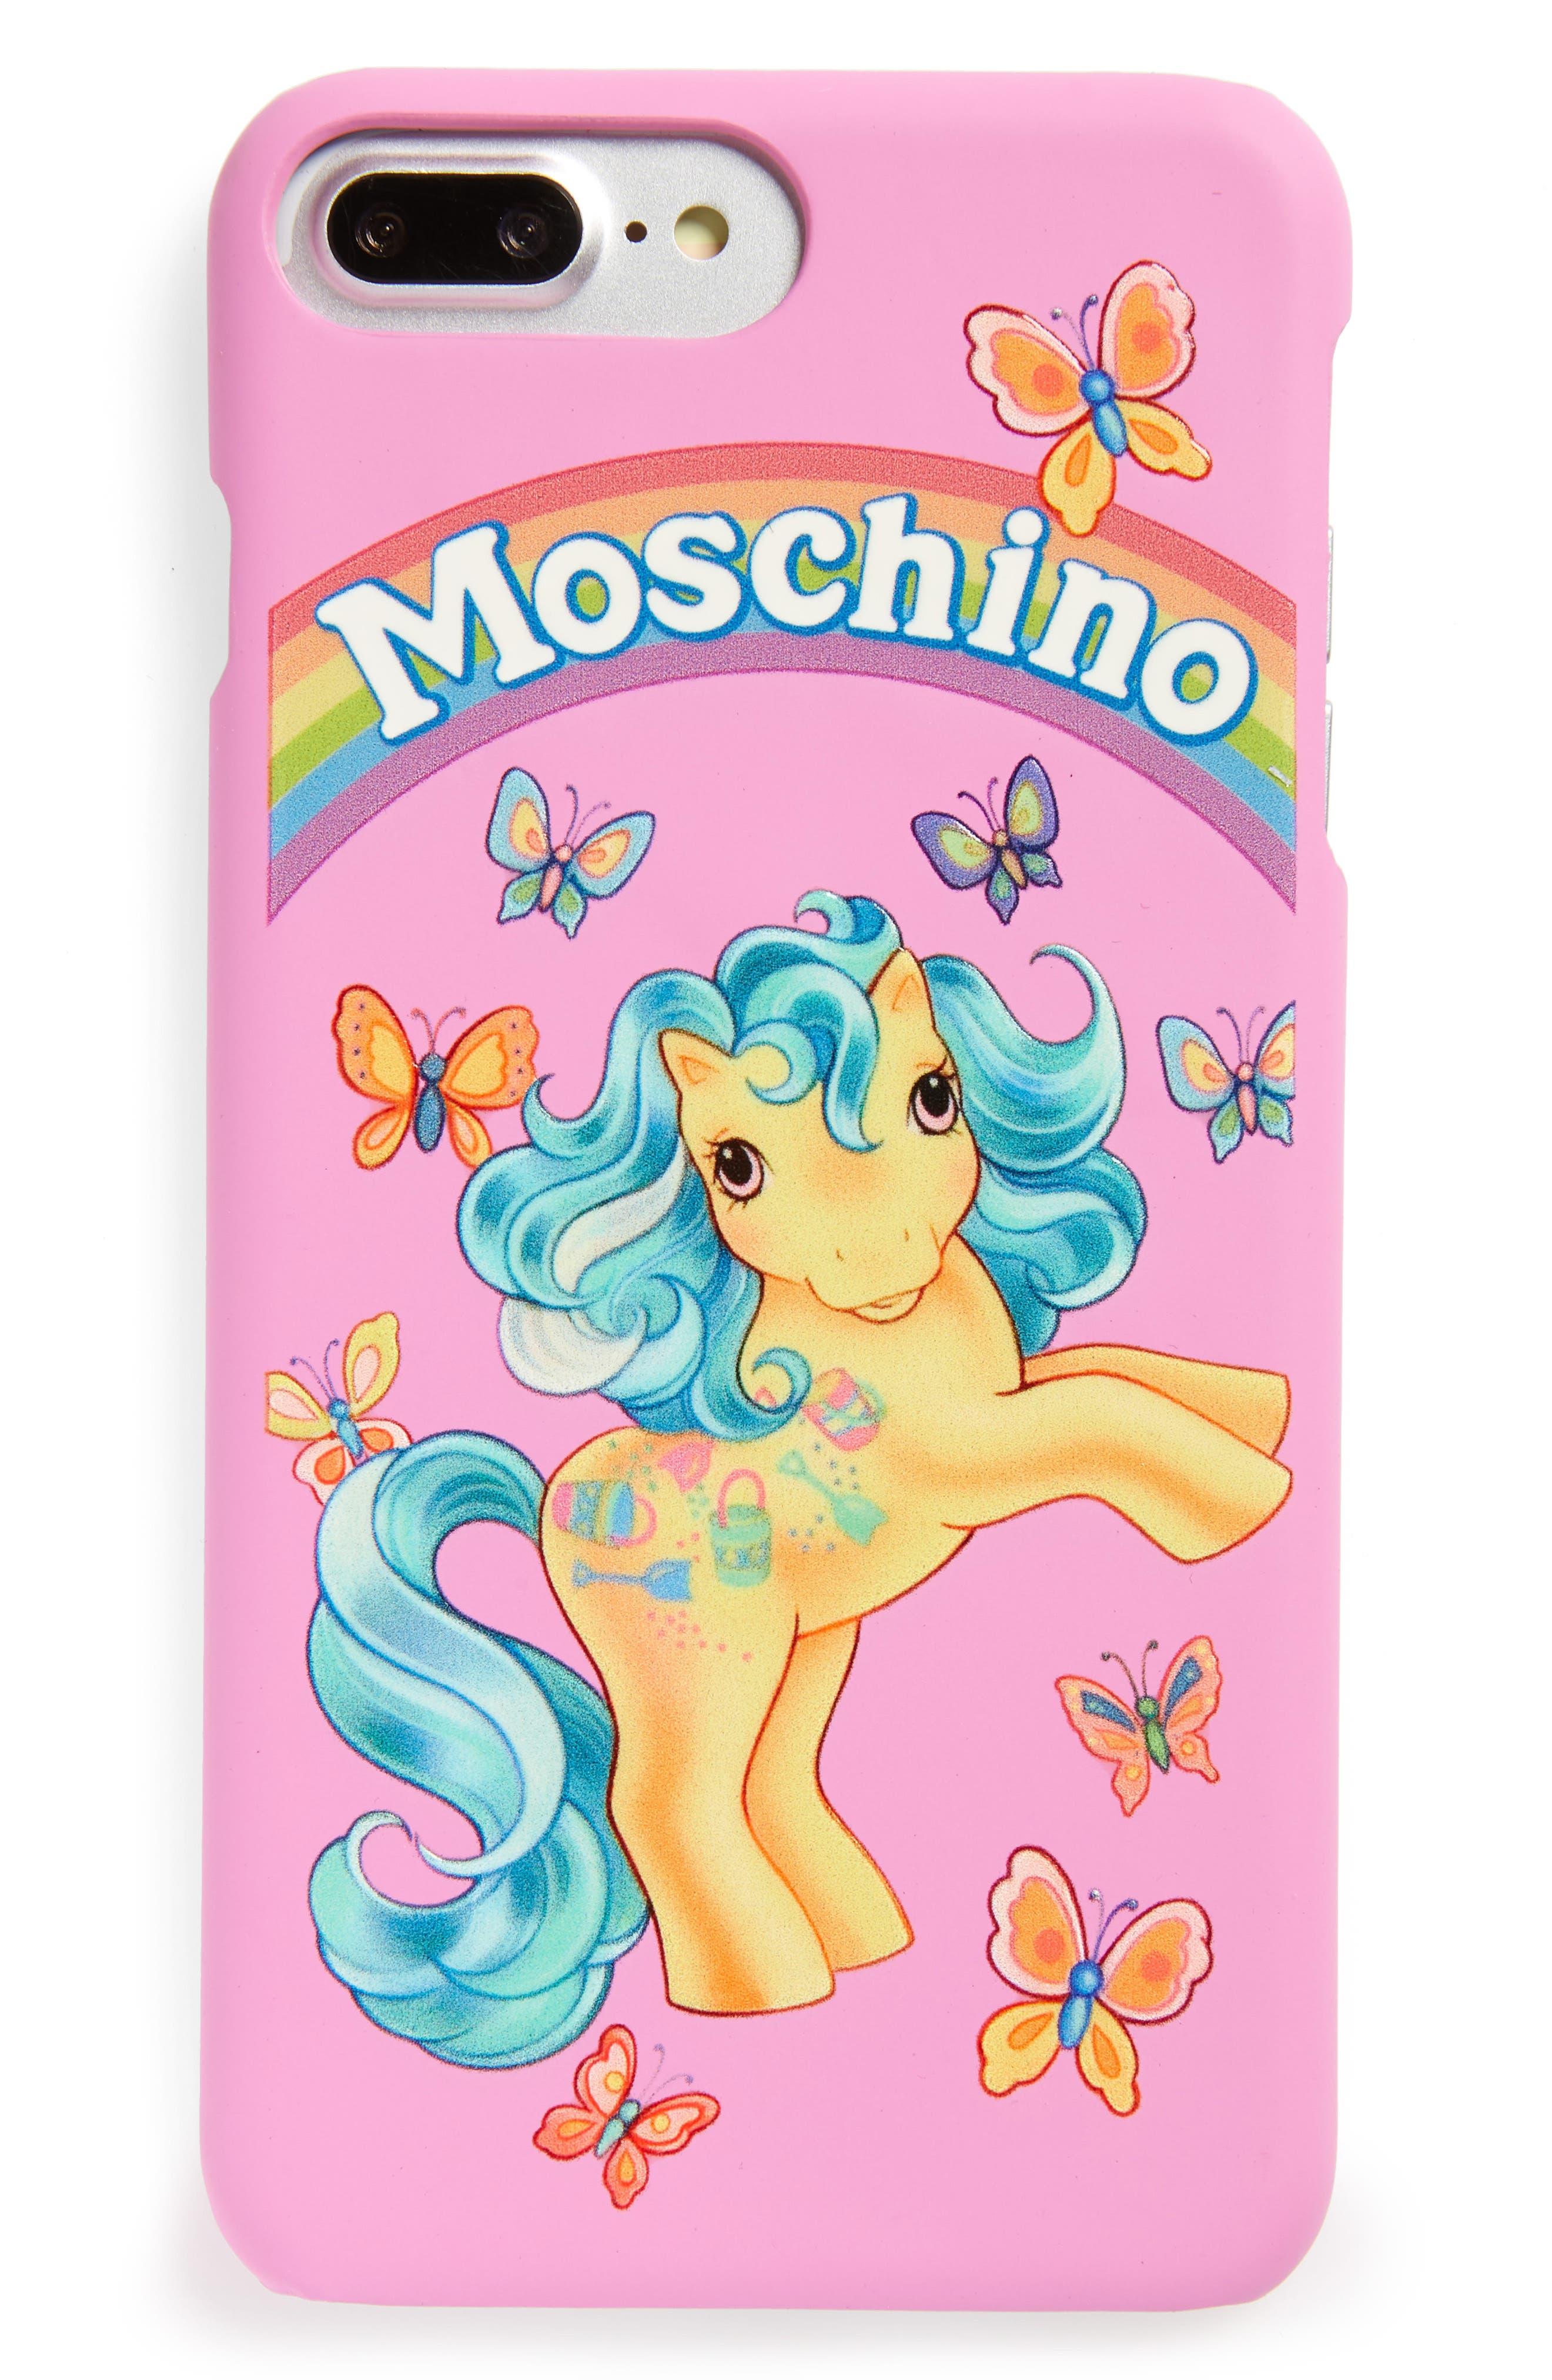 Moschino x My Little Pony iPhone 7 Plus Case